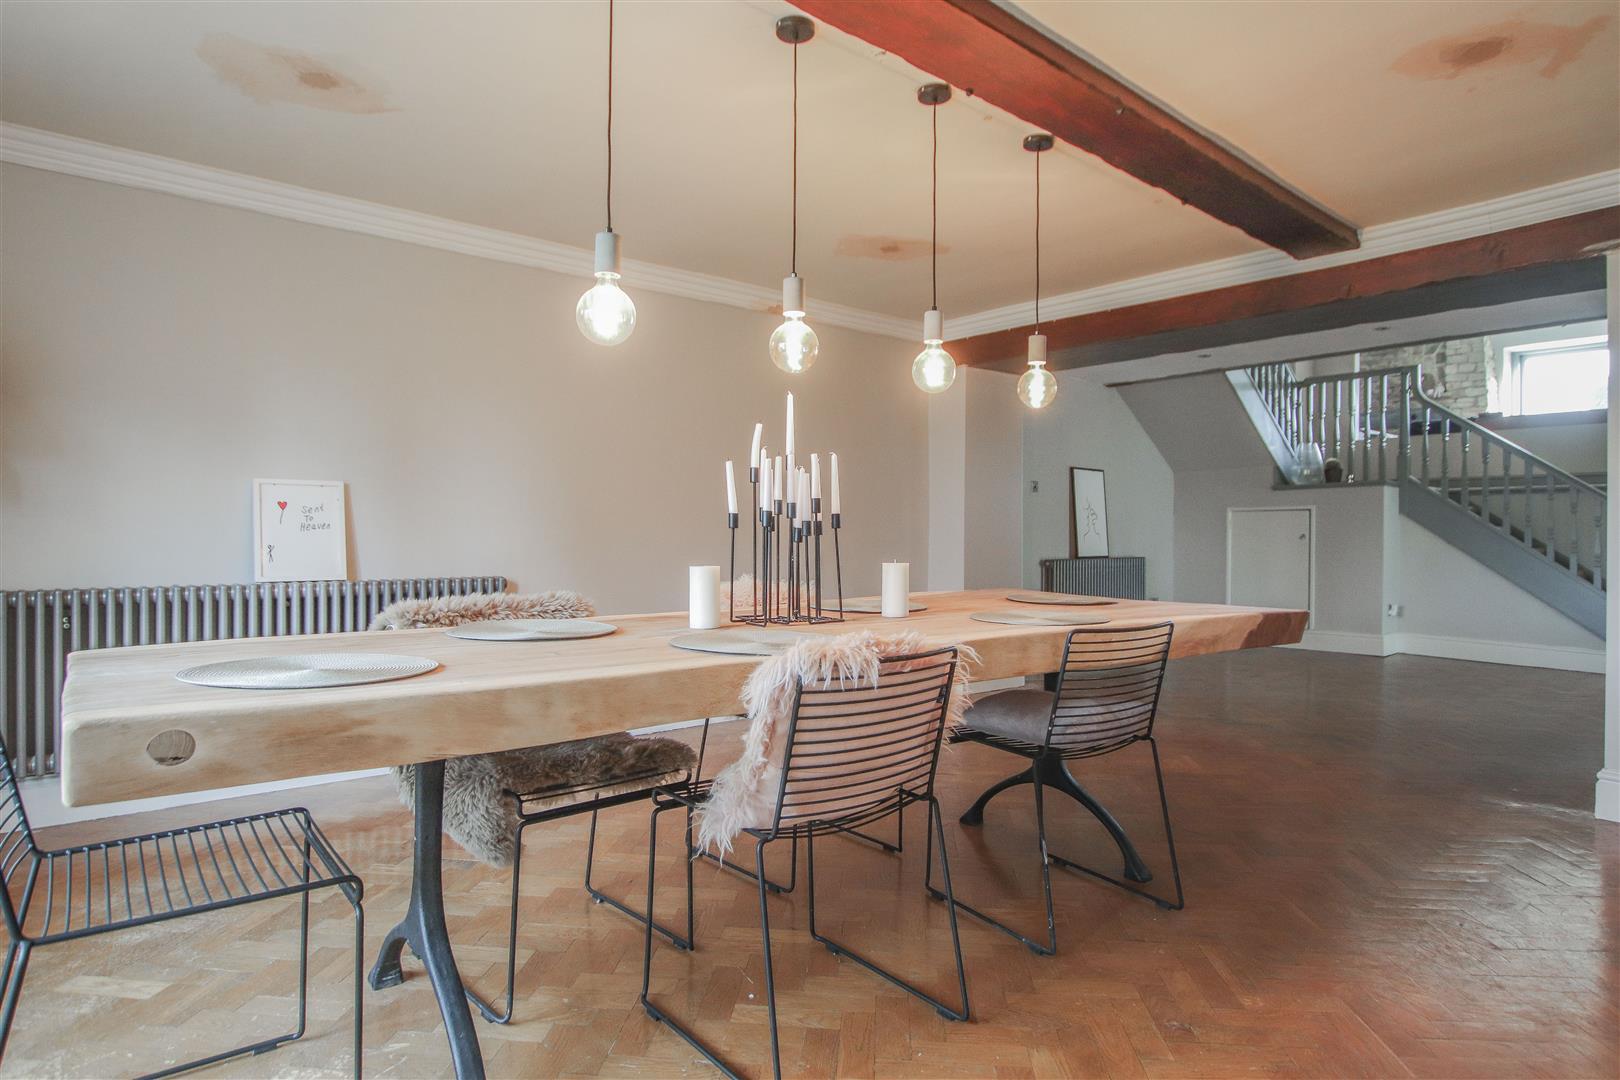 6 Bedroom Barn Conversion For Sale - 3.JPG